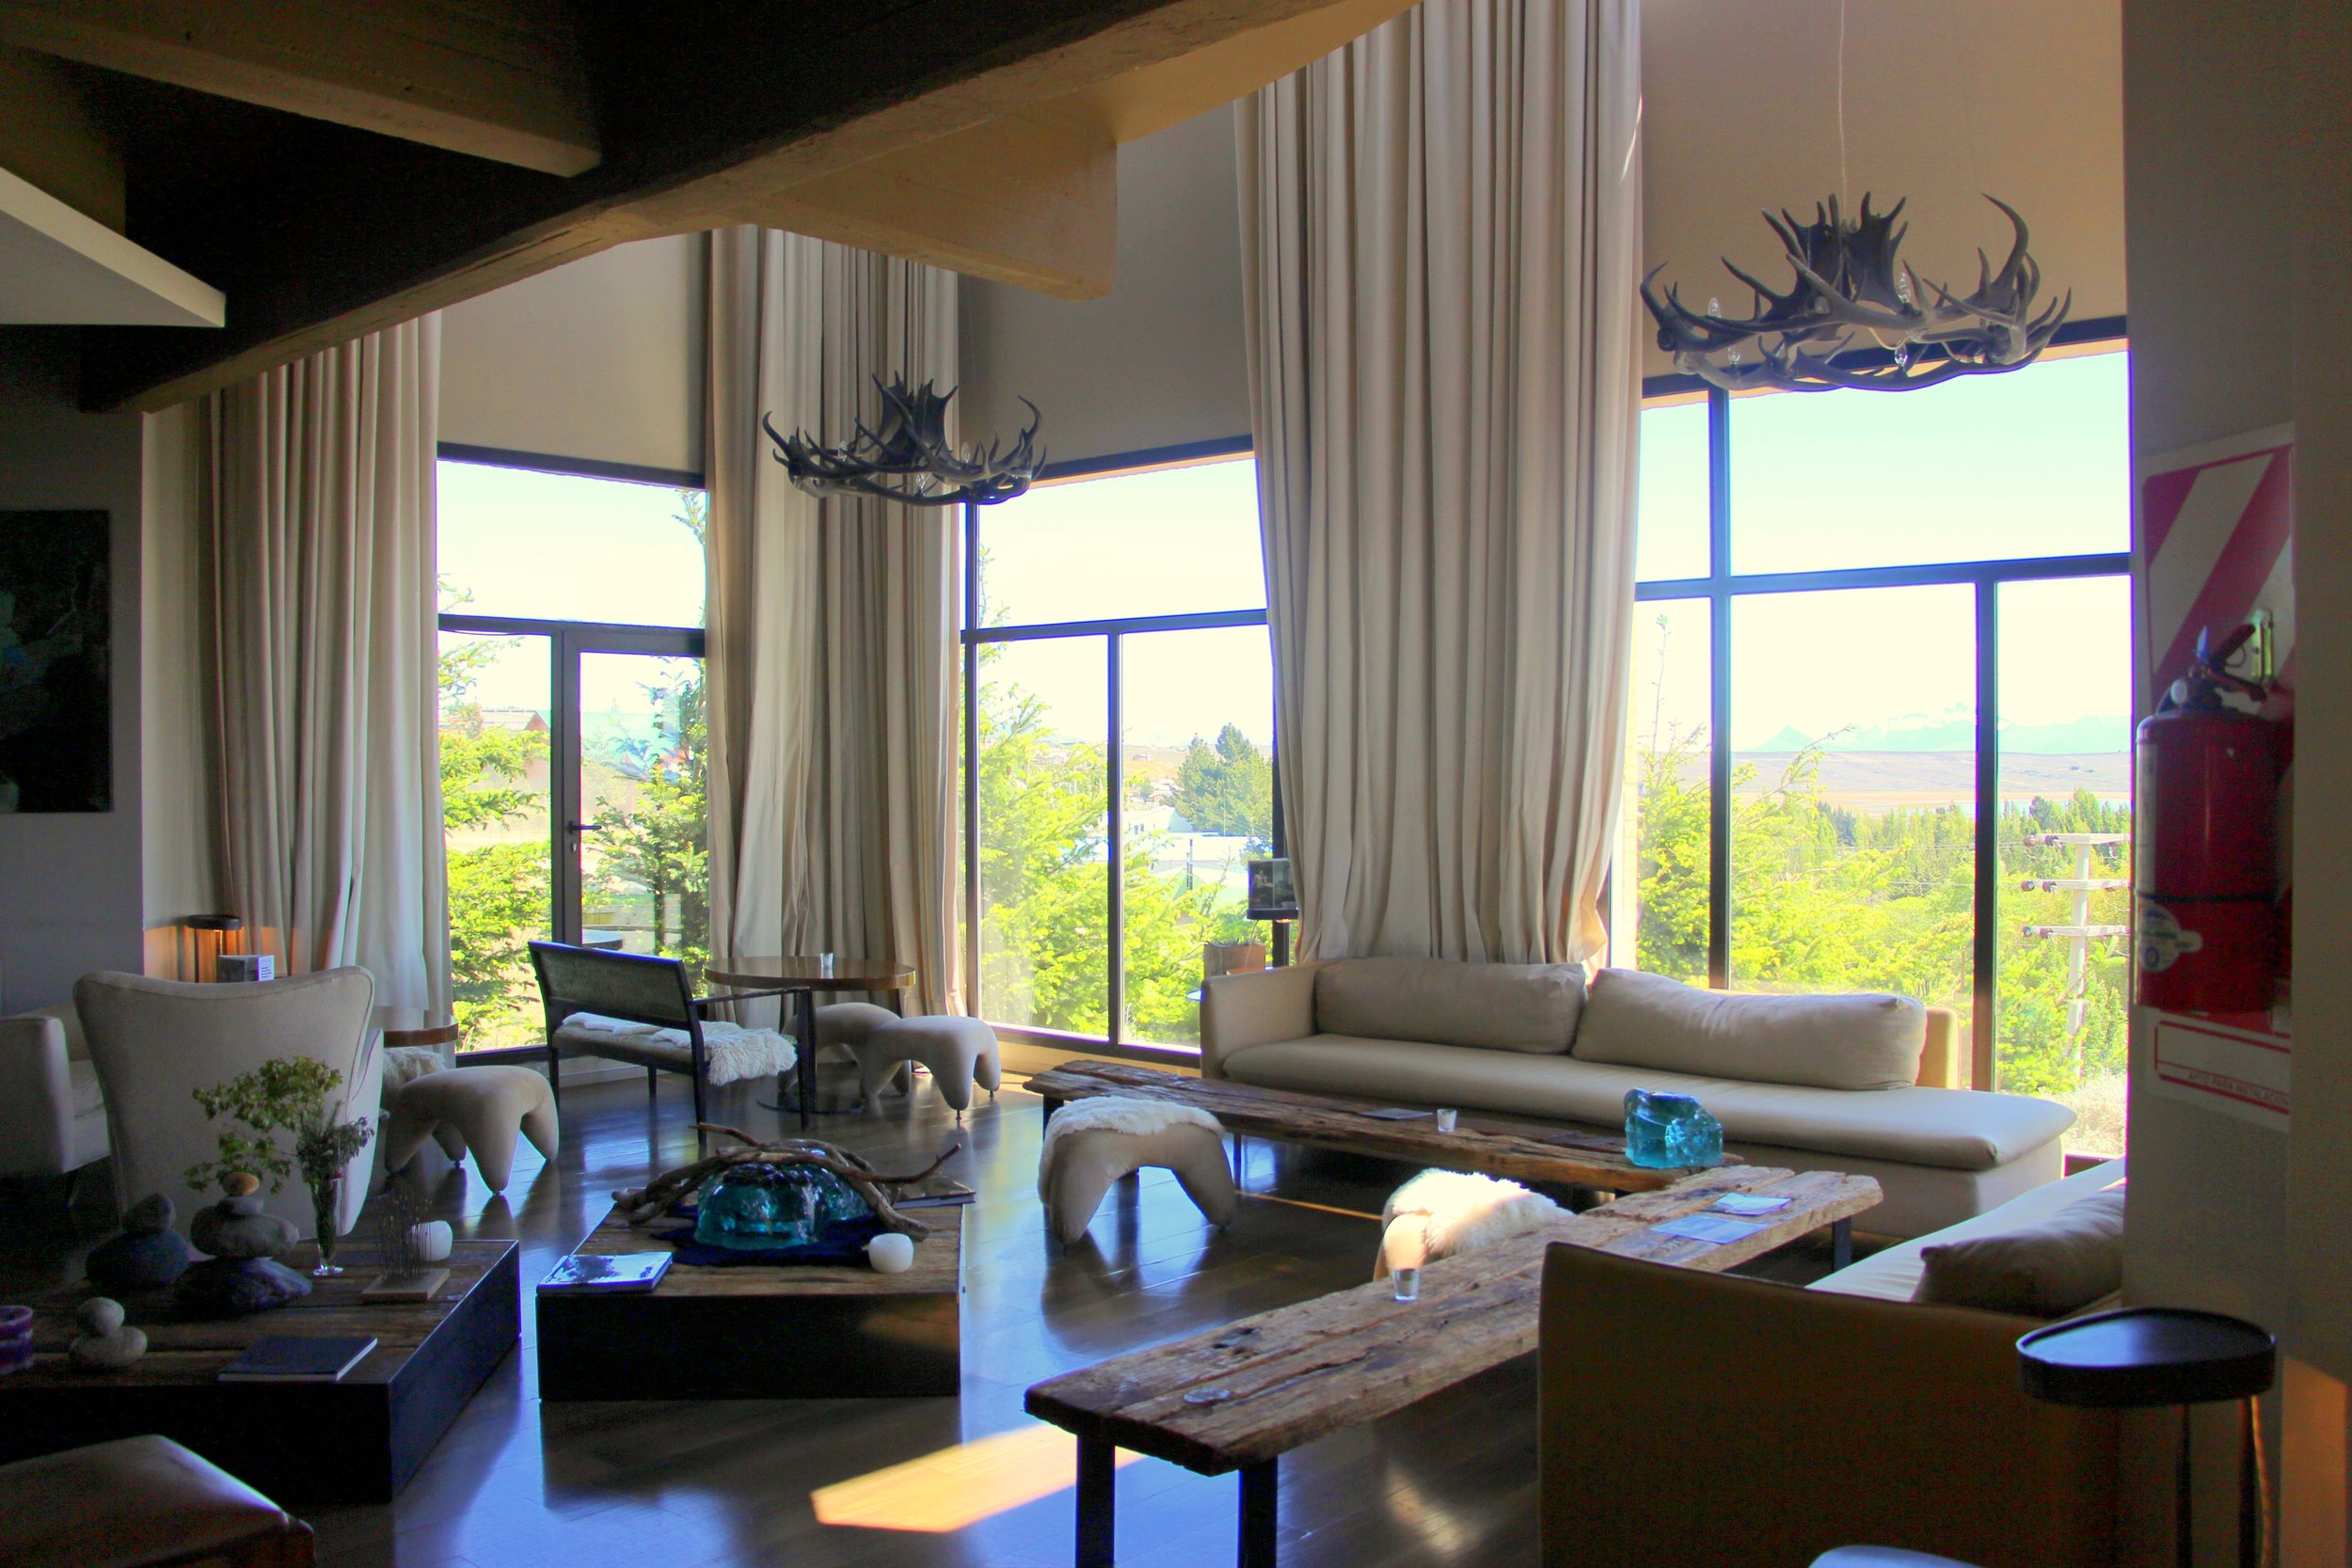 Hotel Esplendor, El Calafate, Patagonia